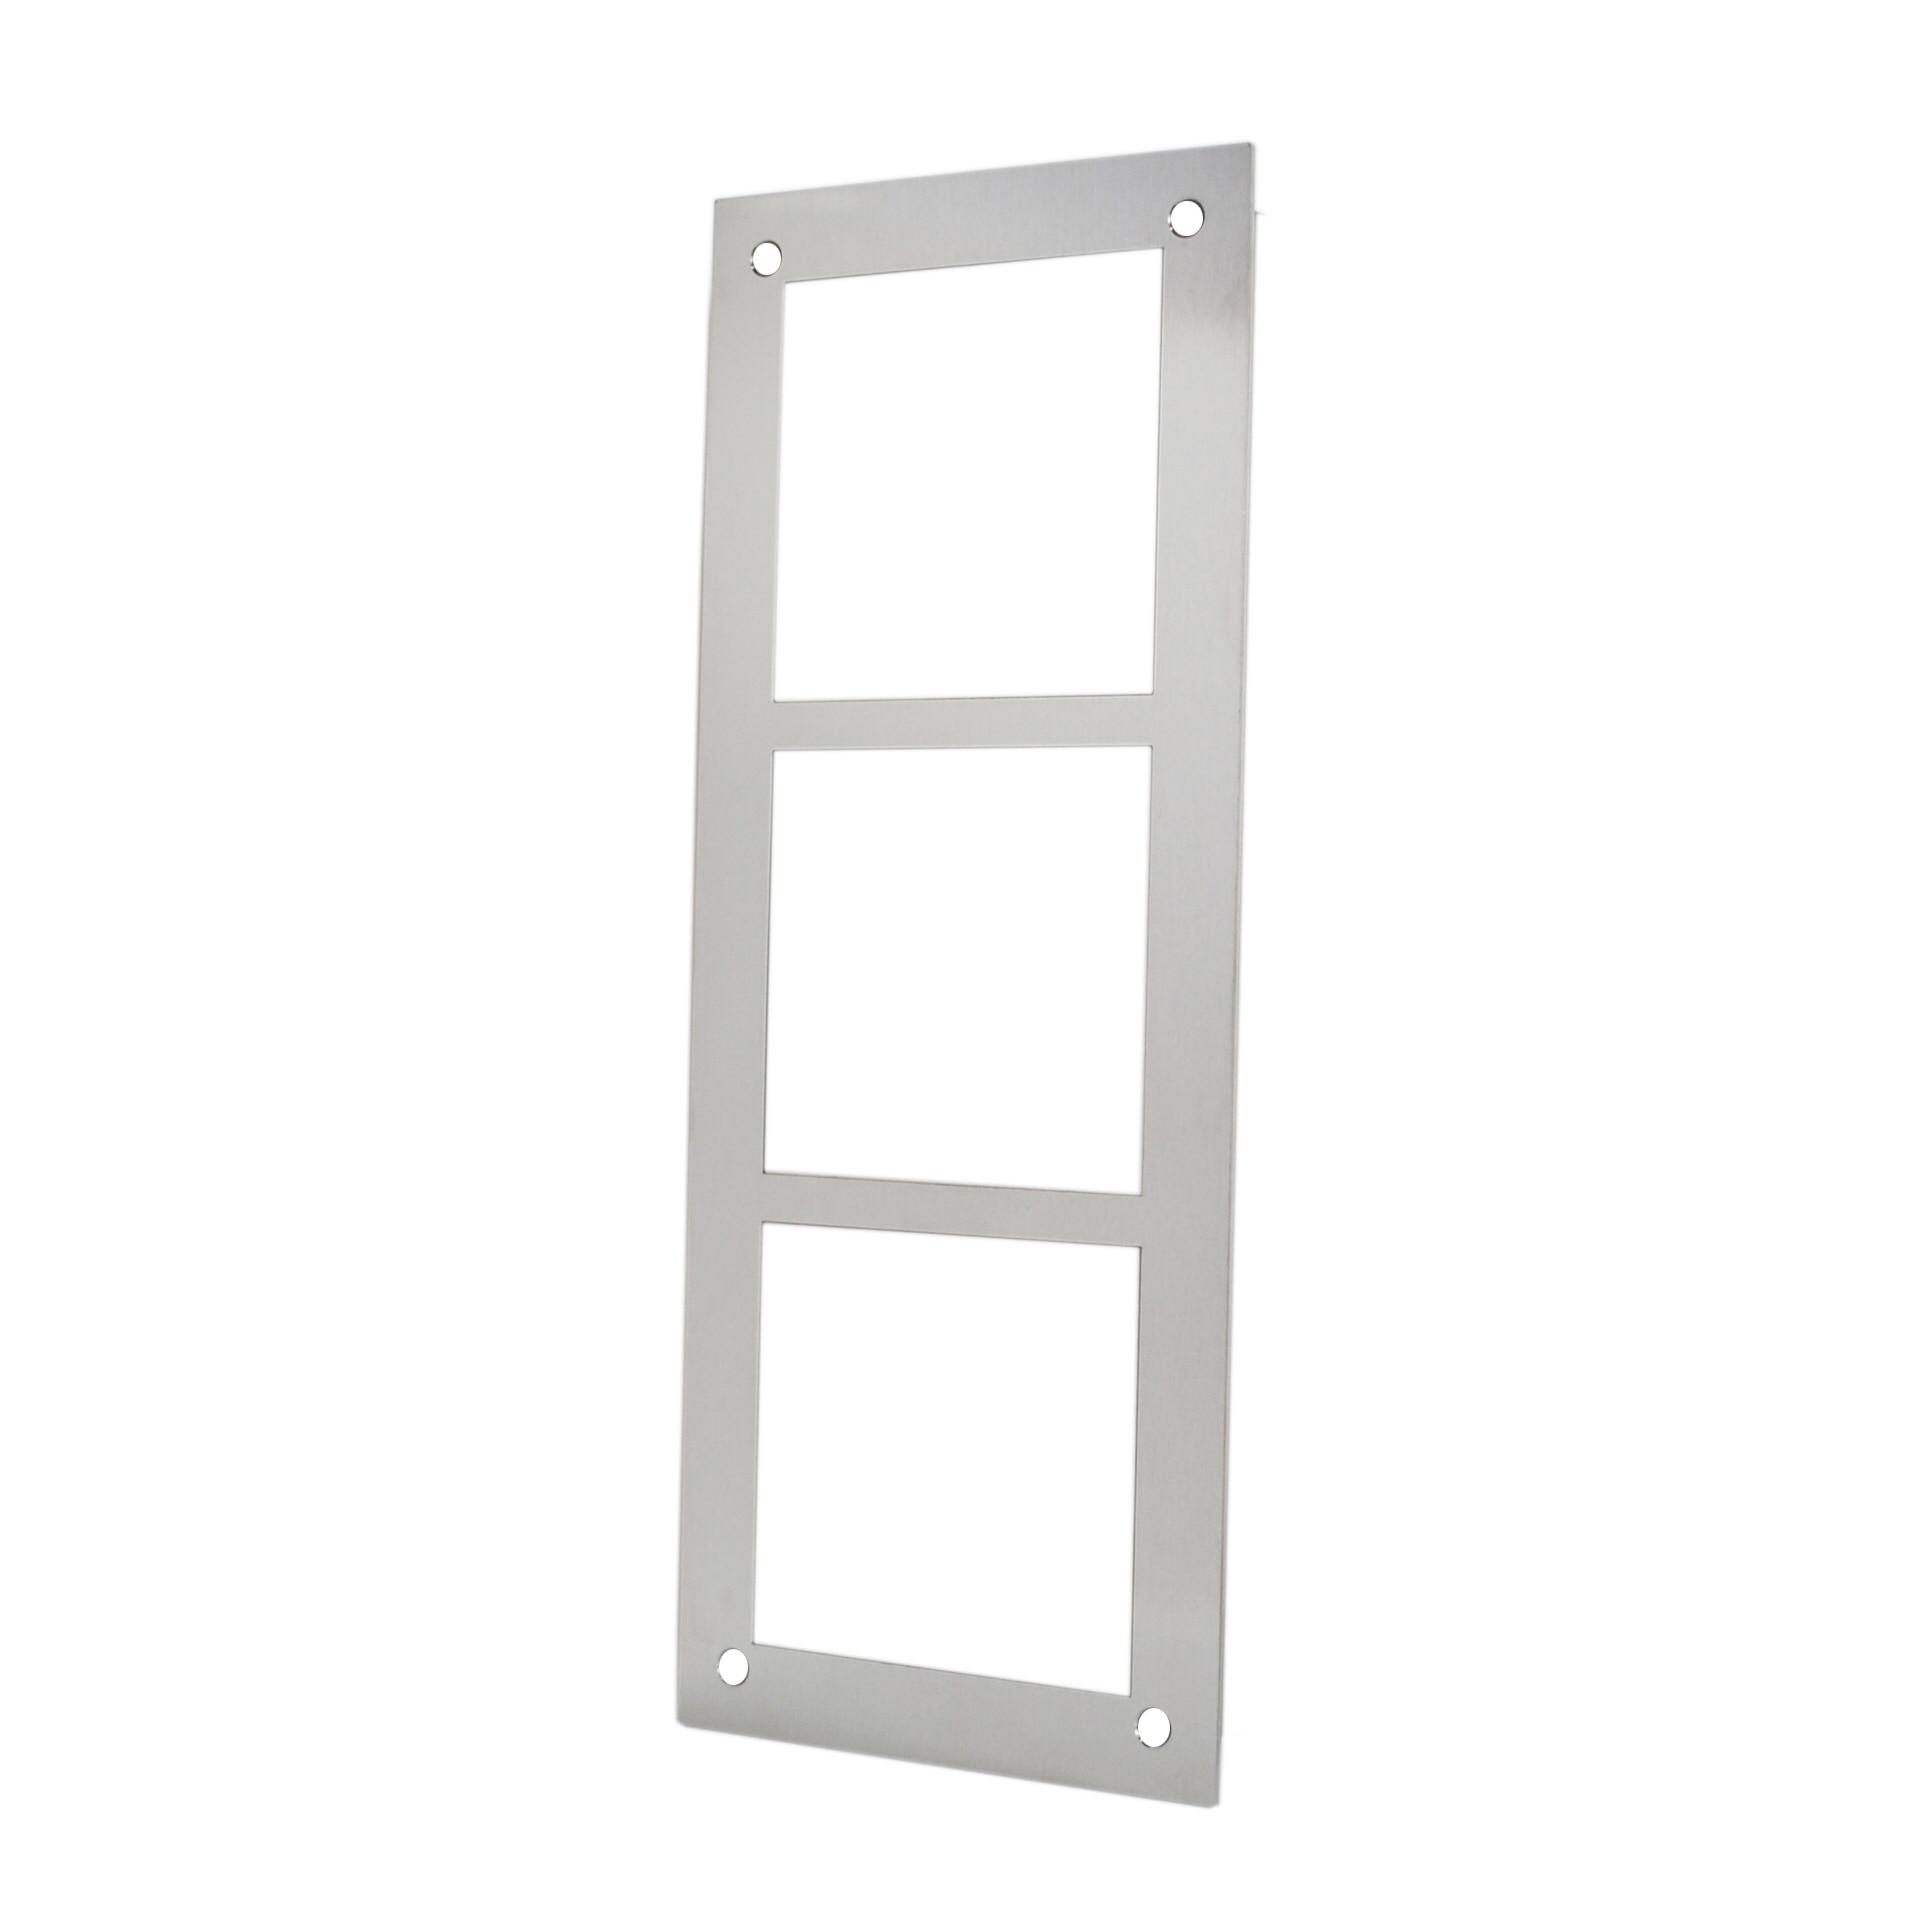 VTOF003 For VTO2000A-C  Front Panel For 3 Modules